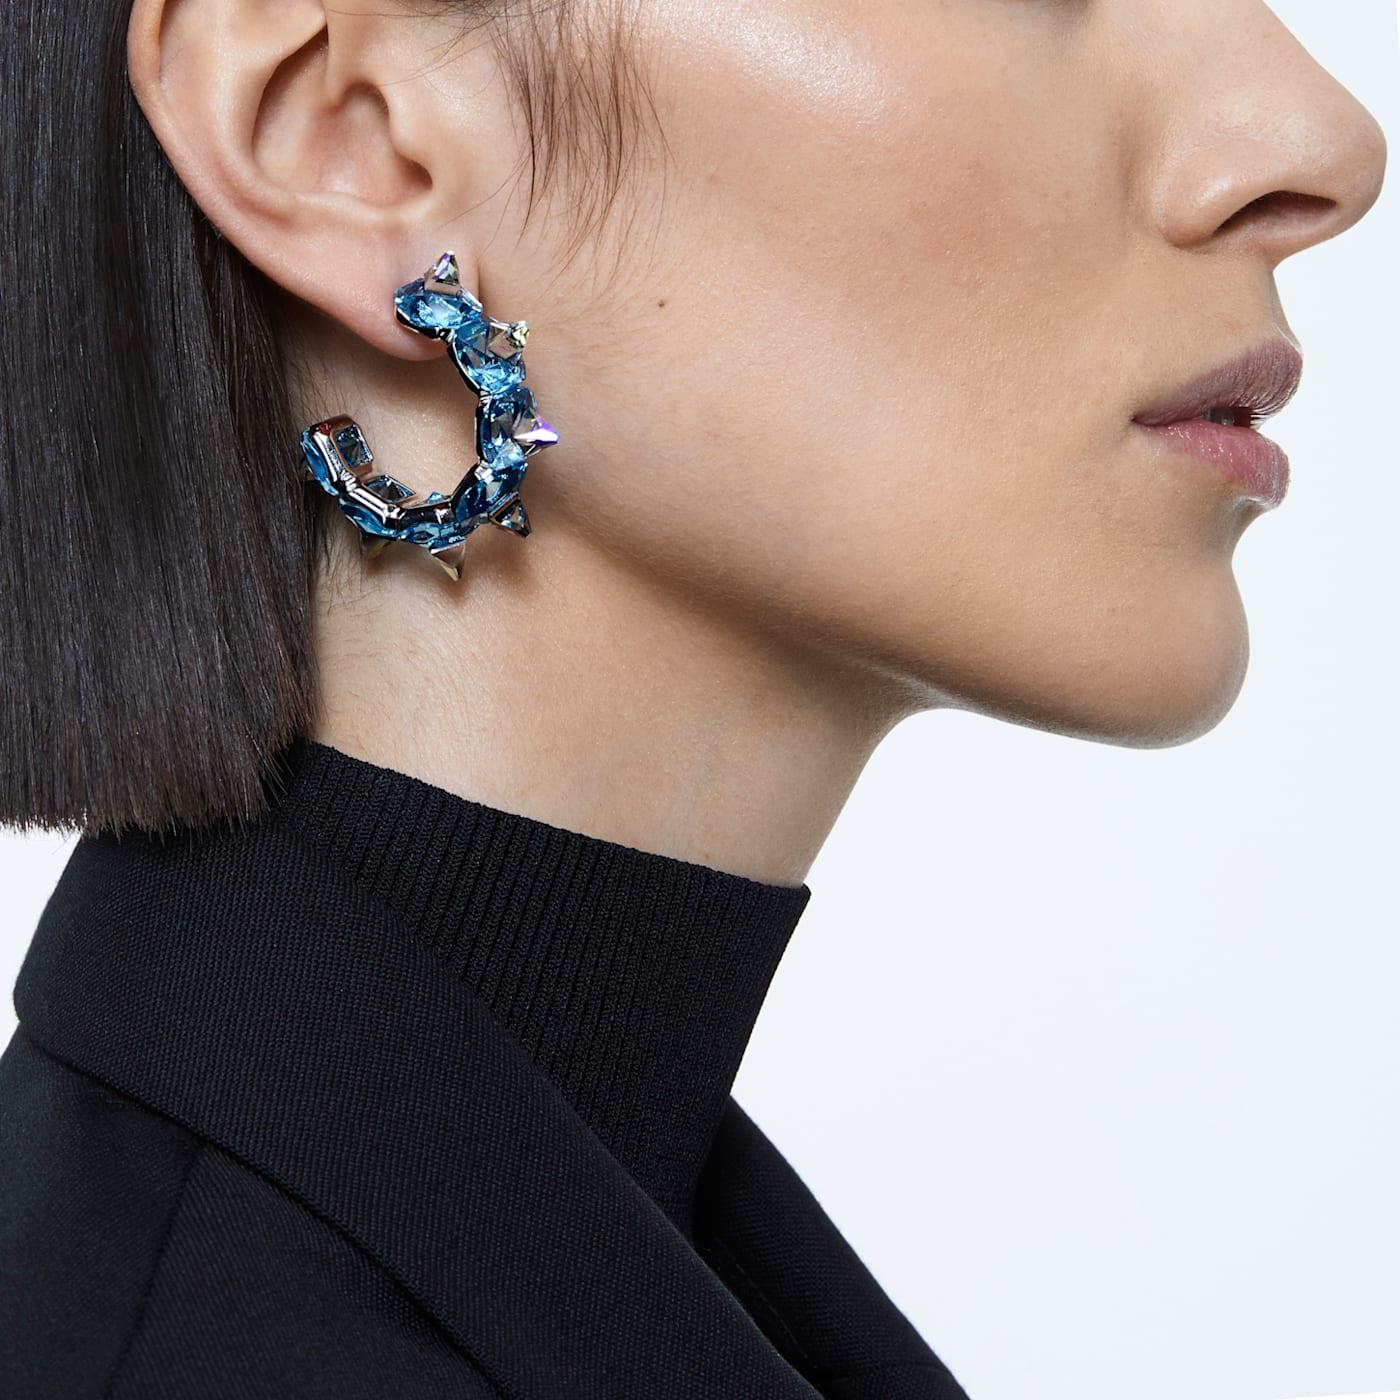 Anneaux d'oreilles Chroma Bleu, Métal rhodié, Swarovski